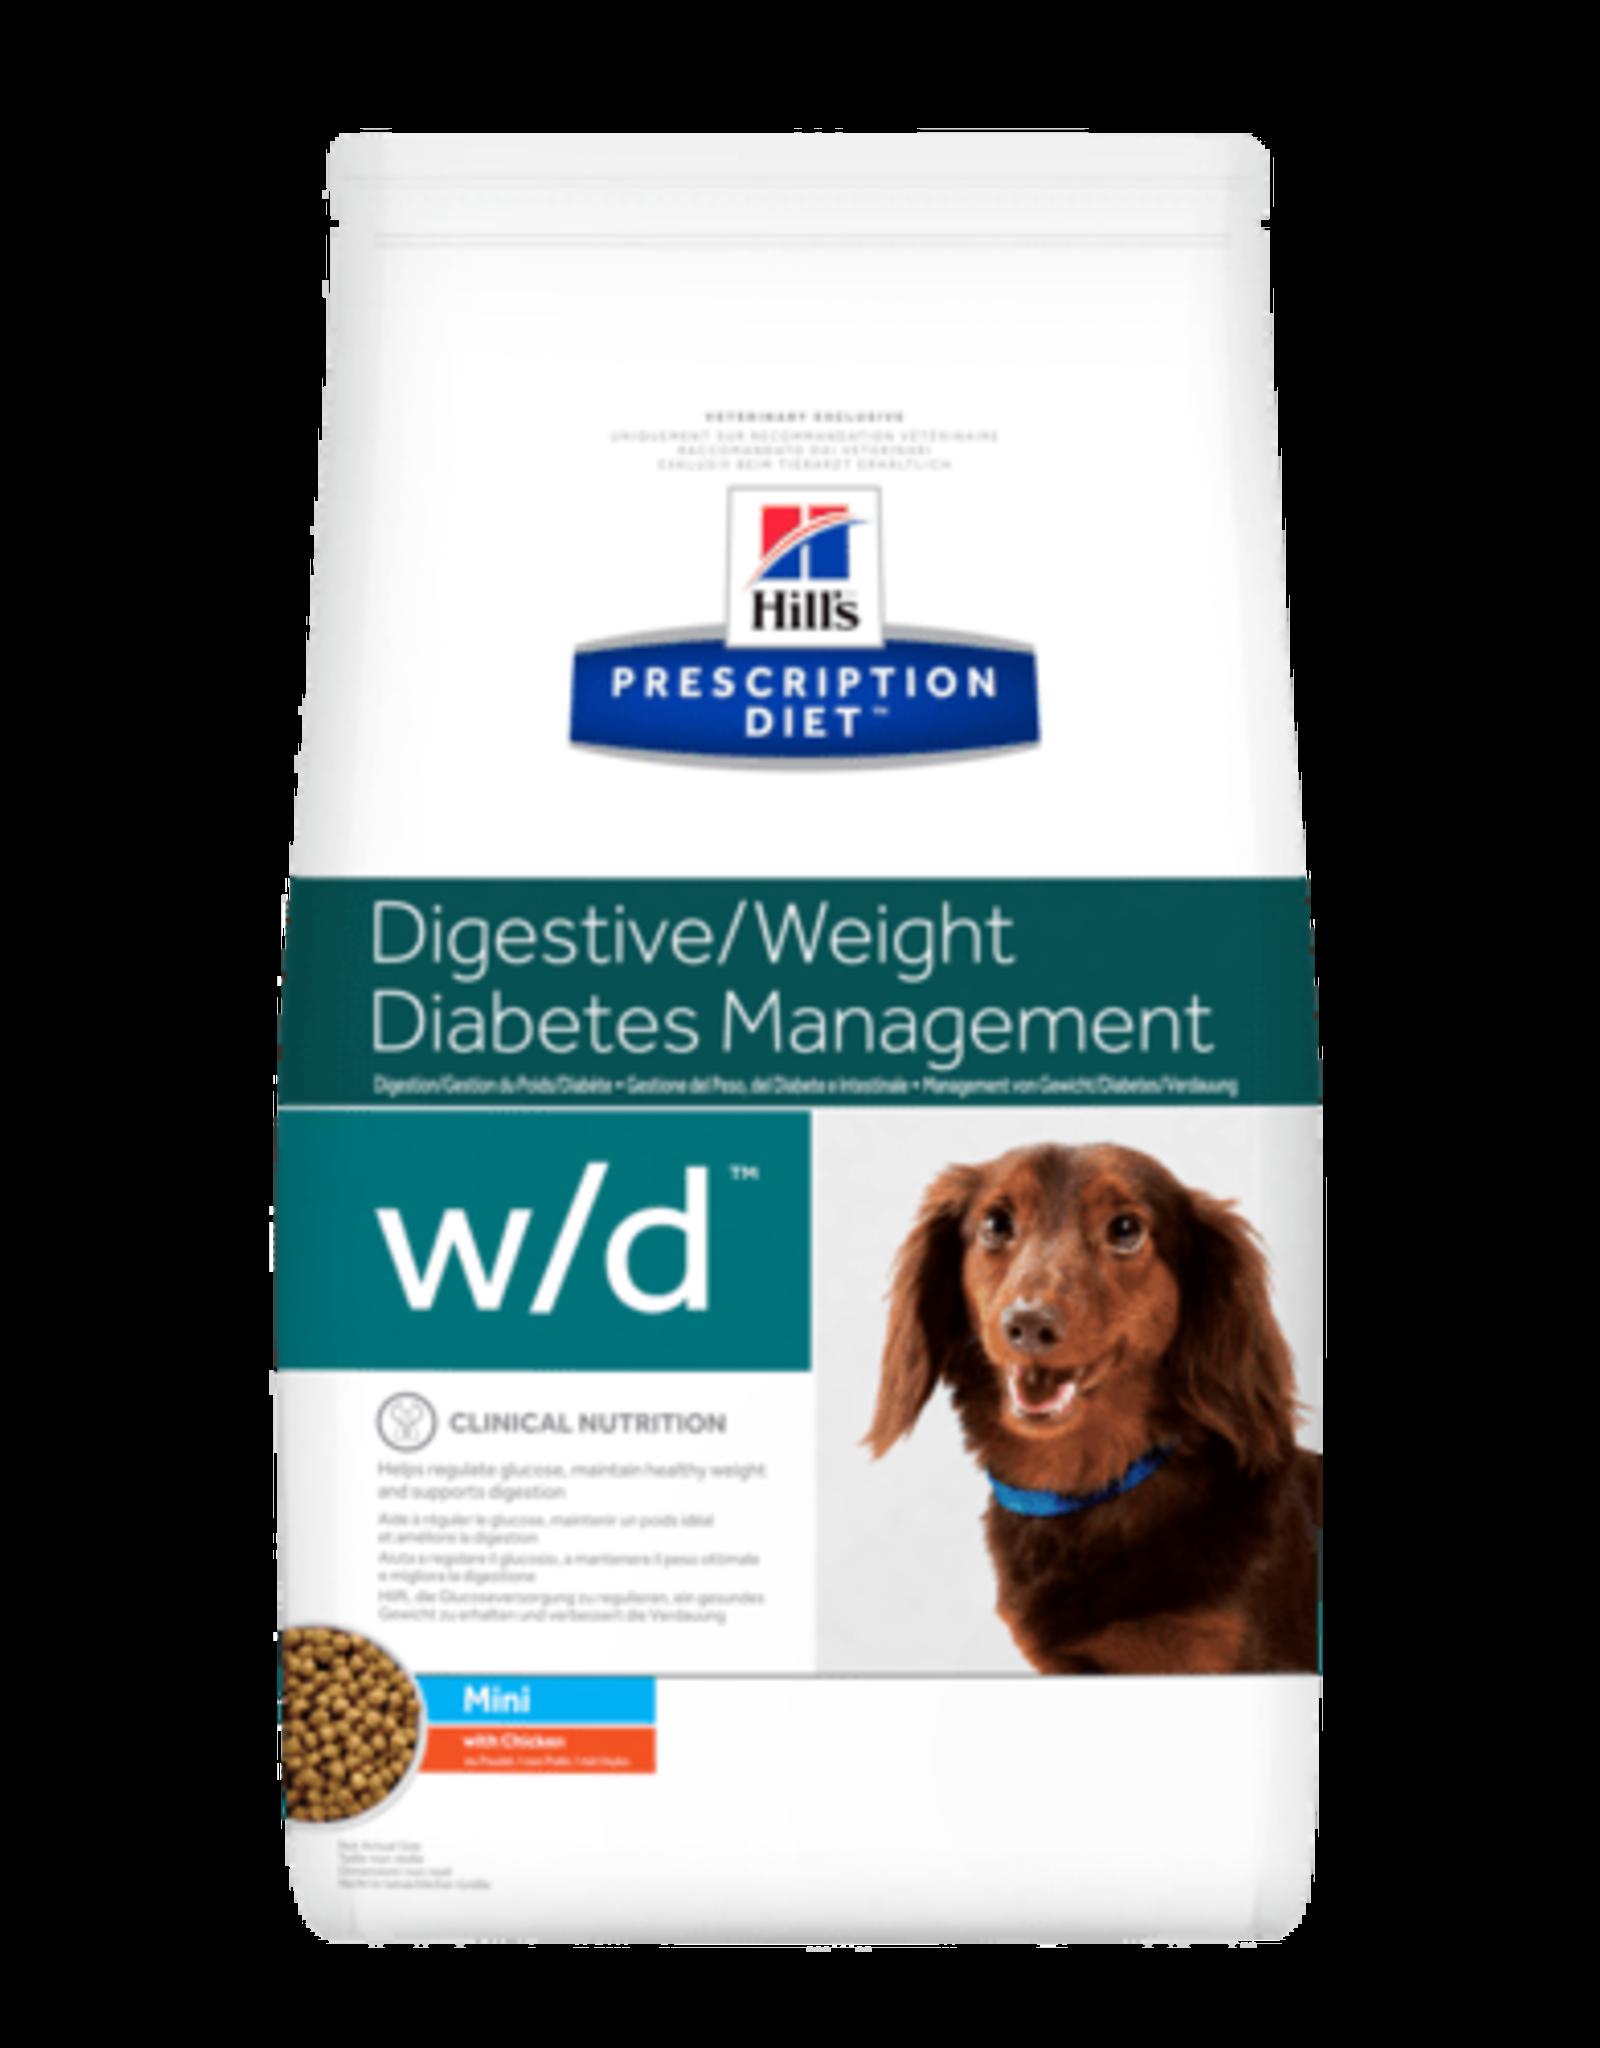 Hill's Hill's Prescription Diet W/d Mini Canine 6kg